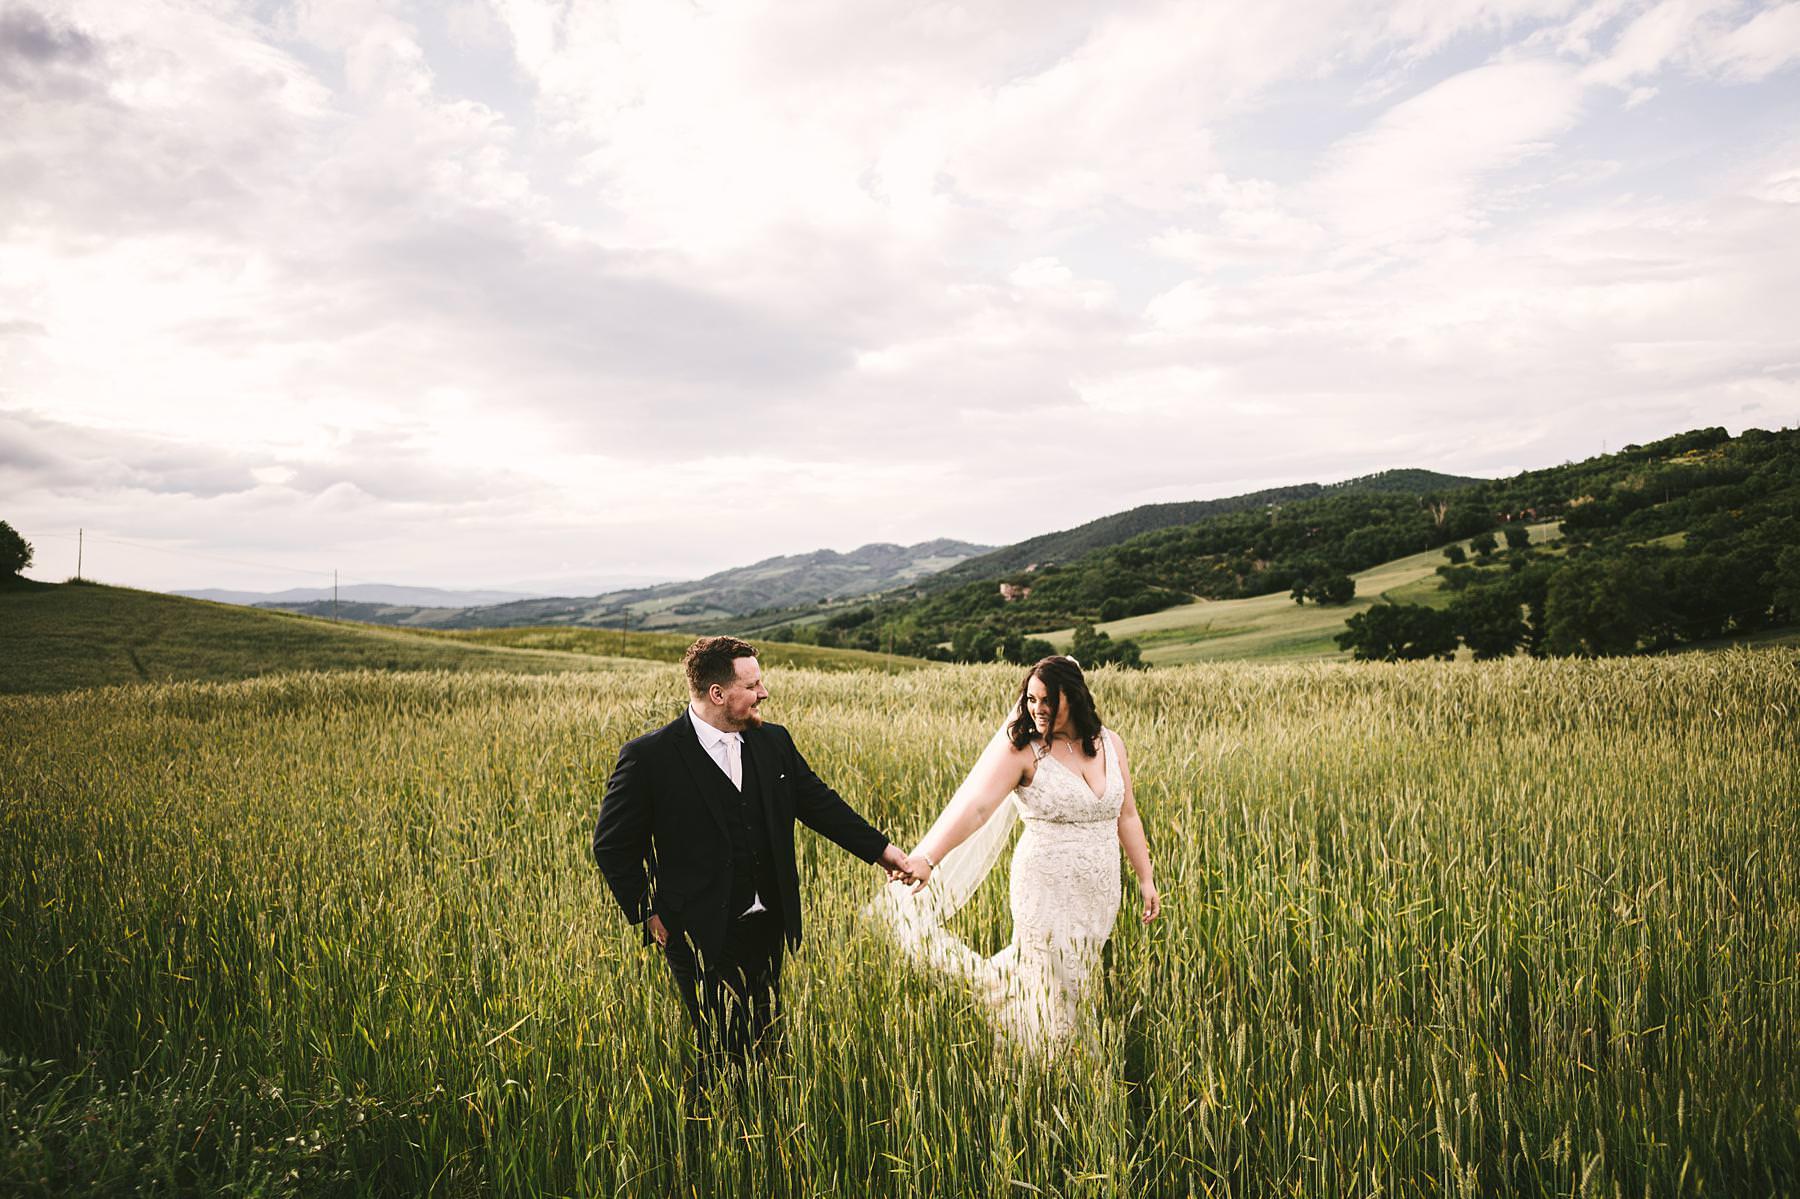 Blissful and intimate destination wedding at Villa Le Bolli, Tuscany. Unforgettable bride groom wedding portrait in the countryside of Tuscany near Radicondoli